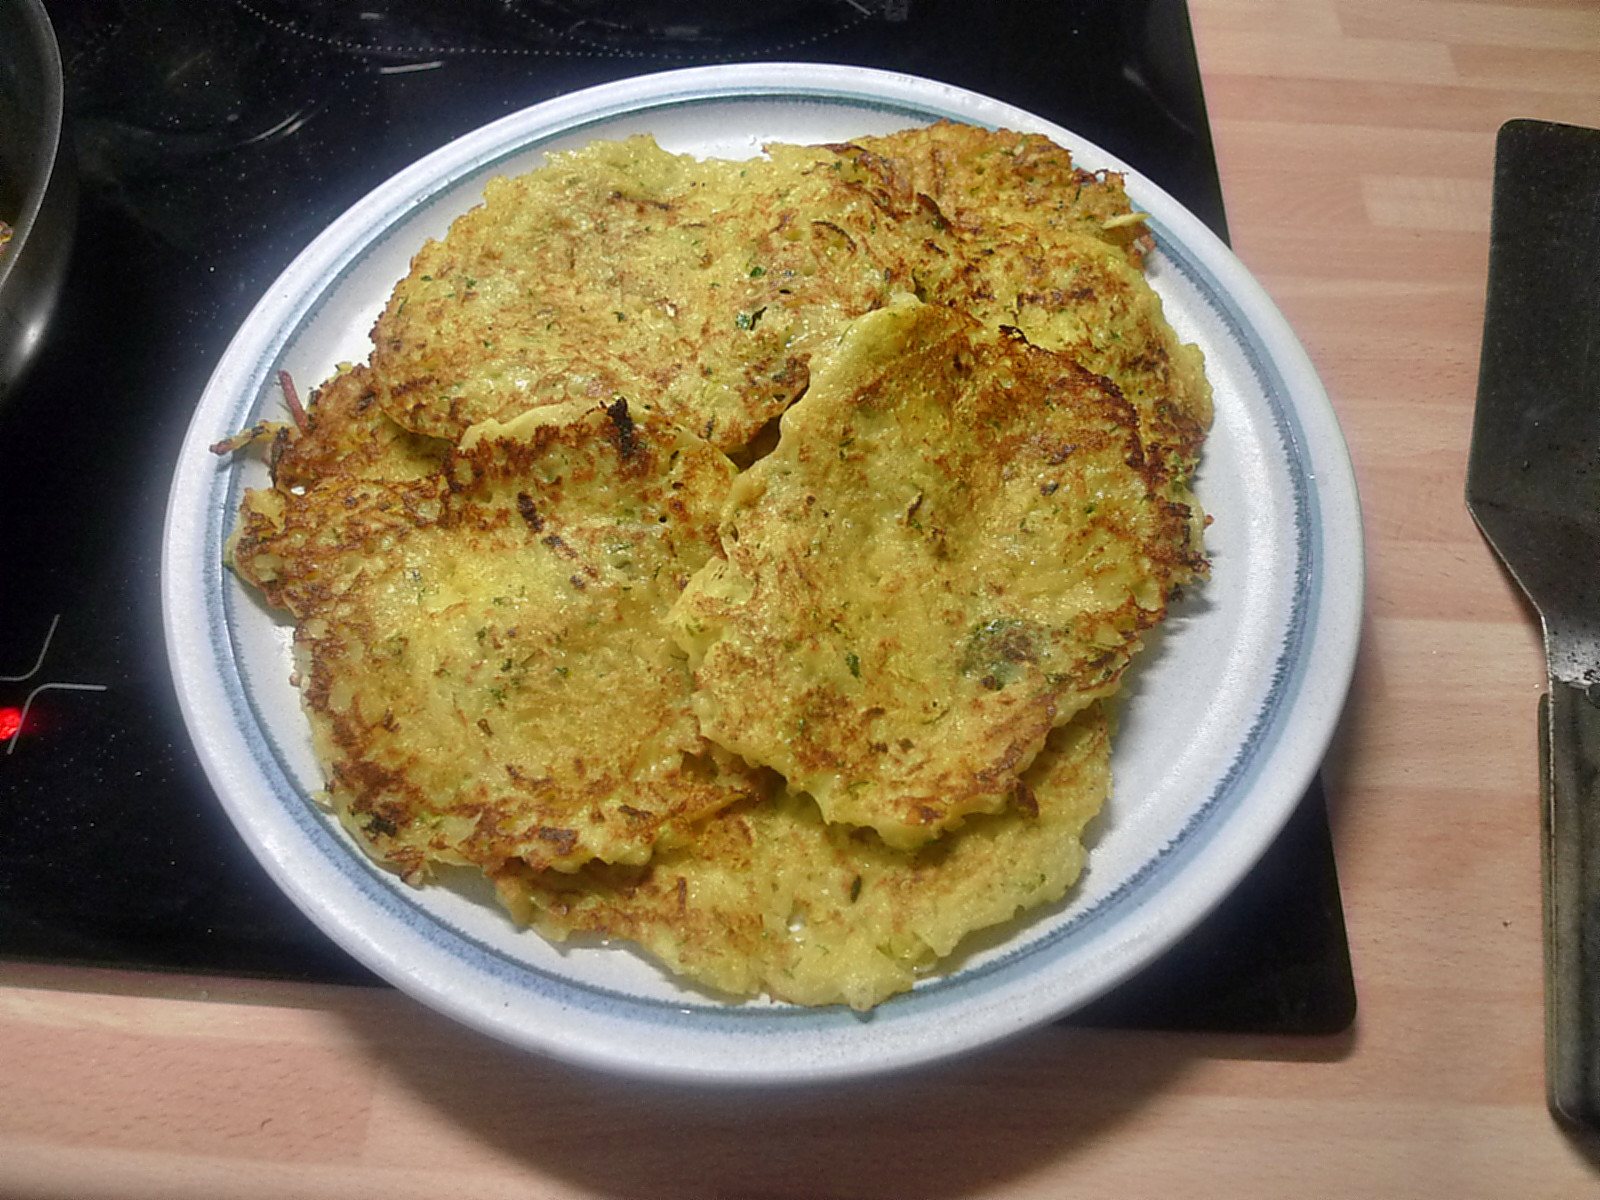 Zucchini-Kartoffelpuffer-26.7.14   (11)